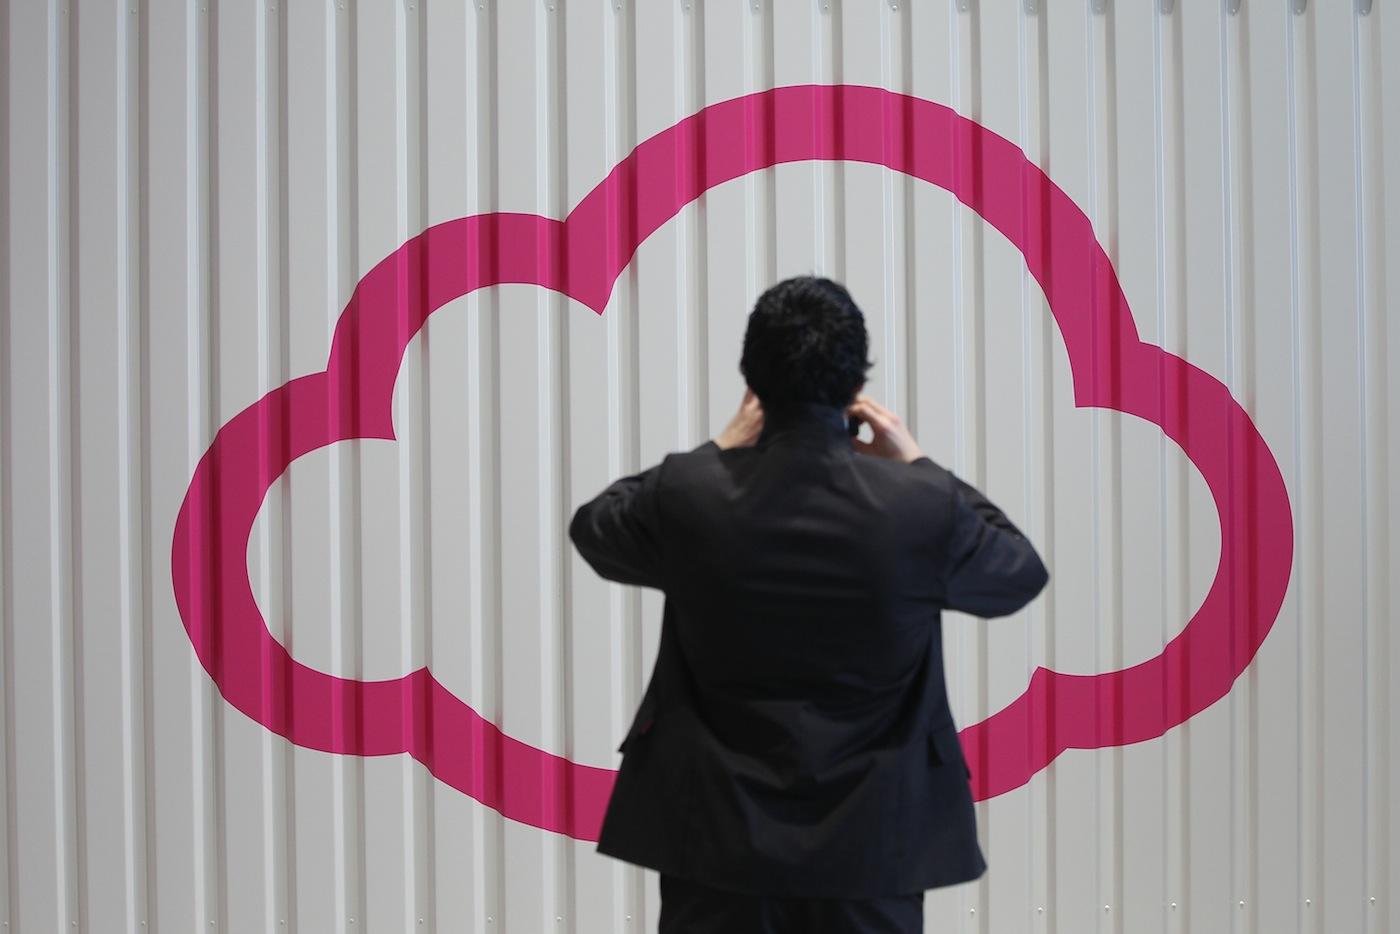 Box teams with Deutsche Telekom in German cloud push (bonus: interview with Box COO Dan Levin)